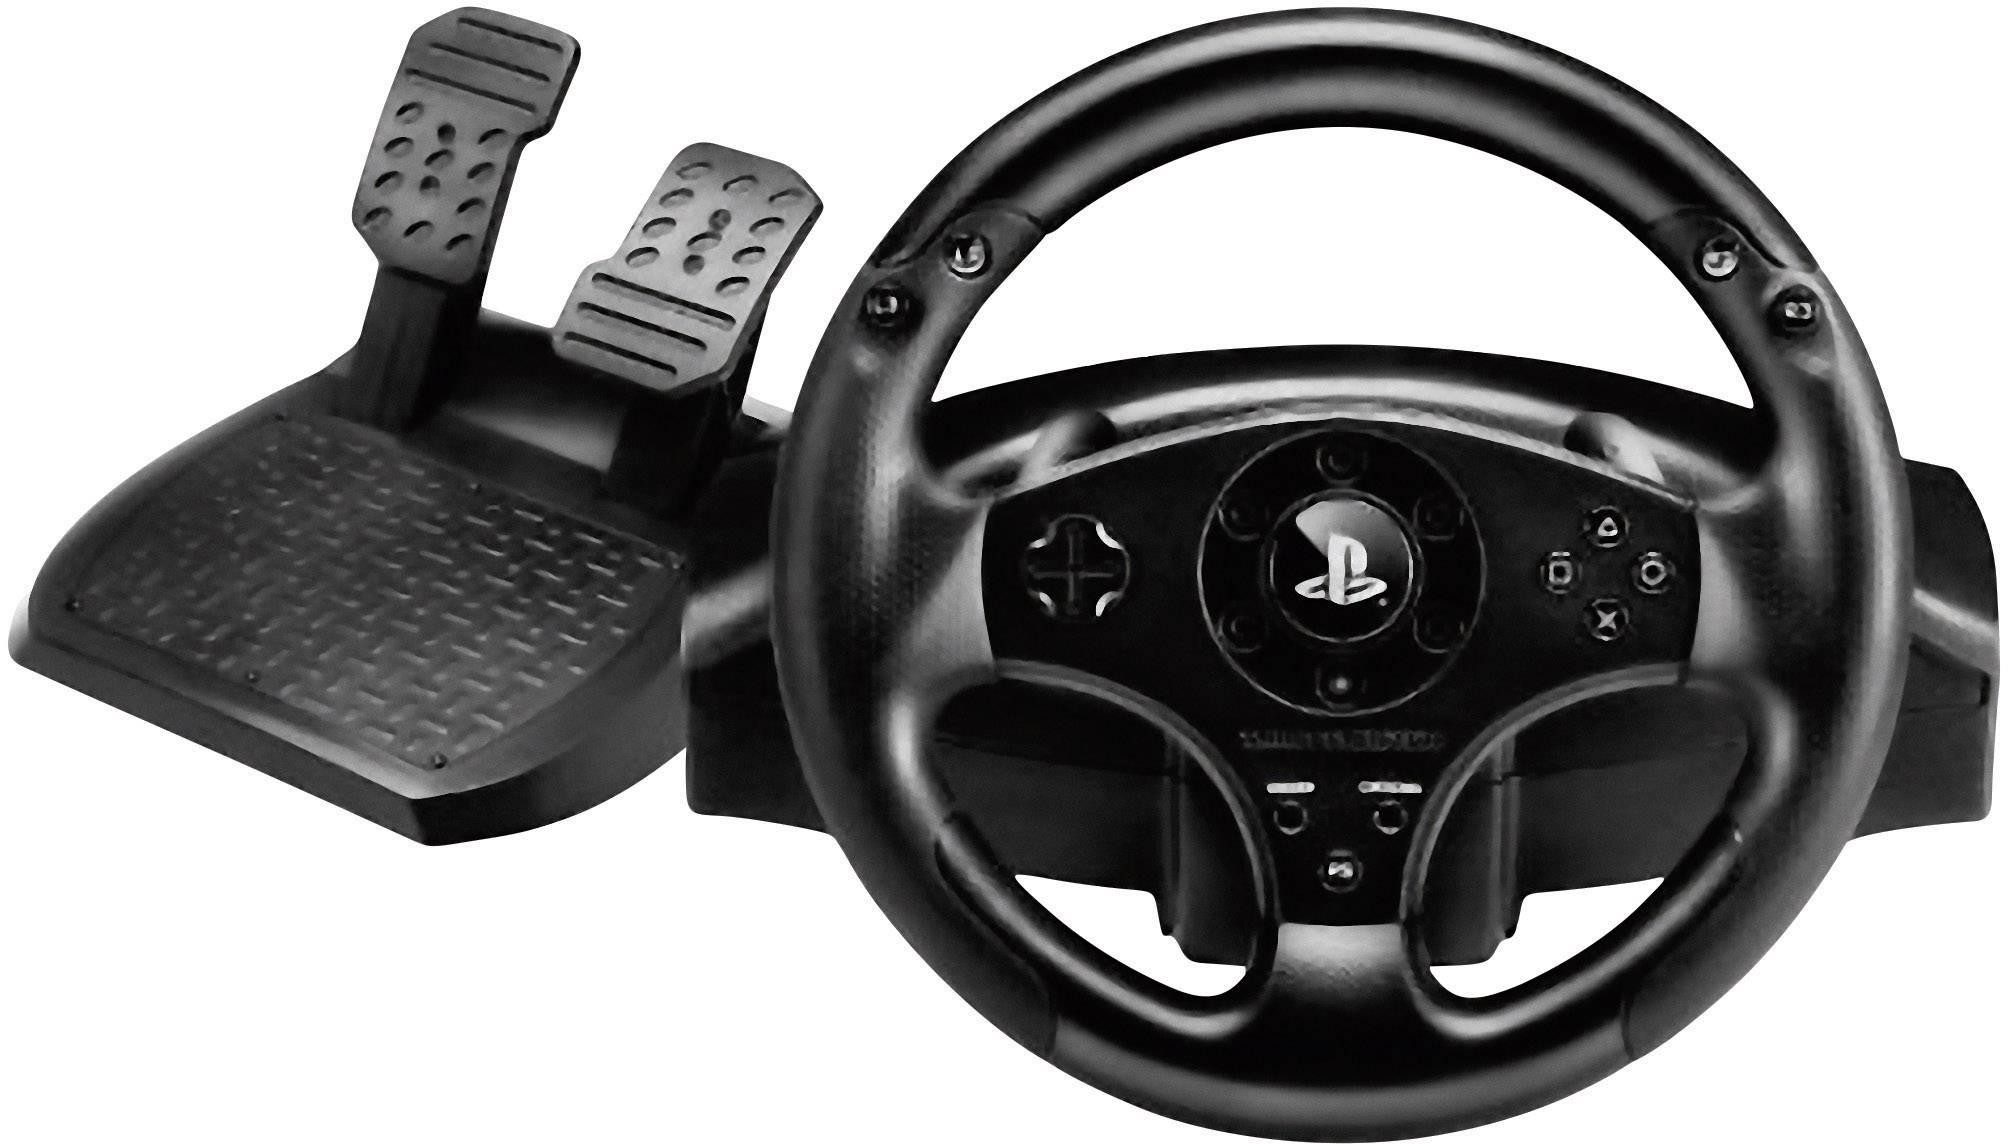 Thrustmaster T80 Racing Wheel Steering wheel PlayStation 3